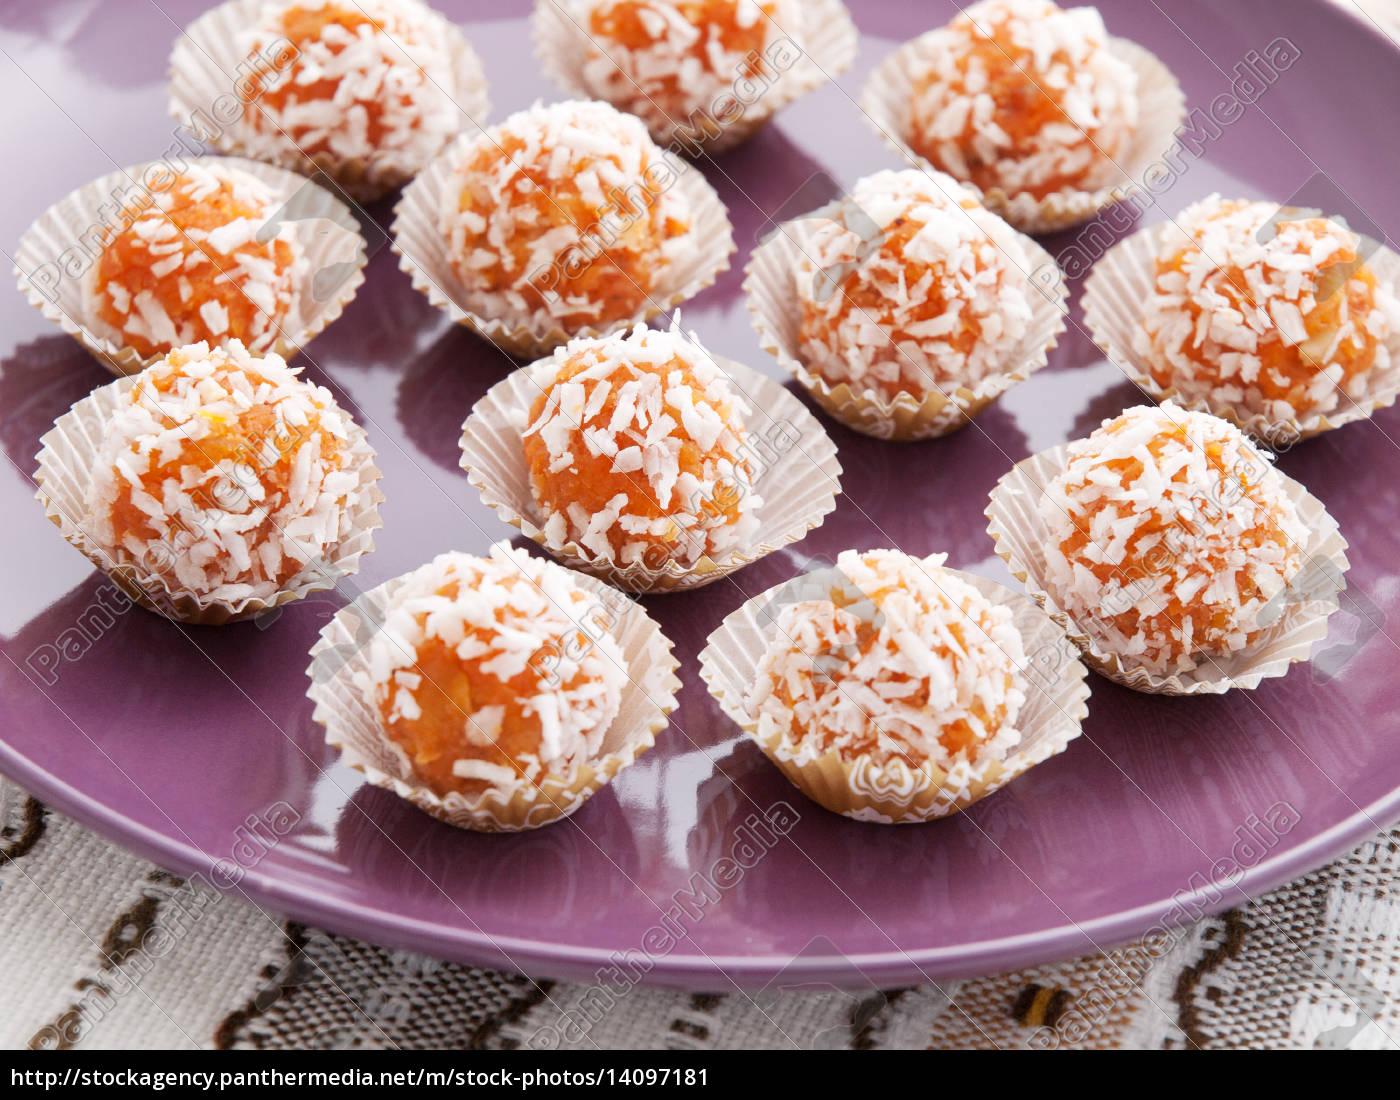 homemade, carrot, candies, homemade, carrot, candies - 14097181